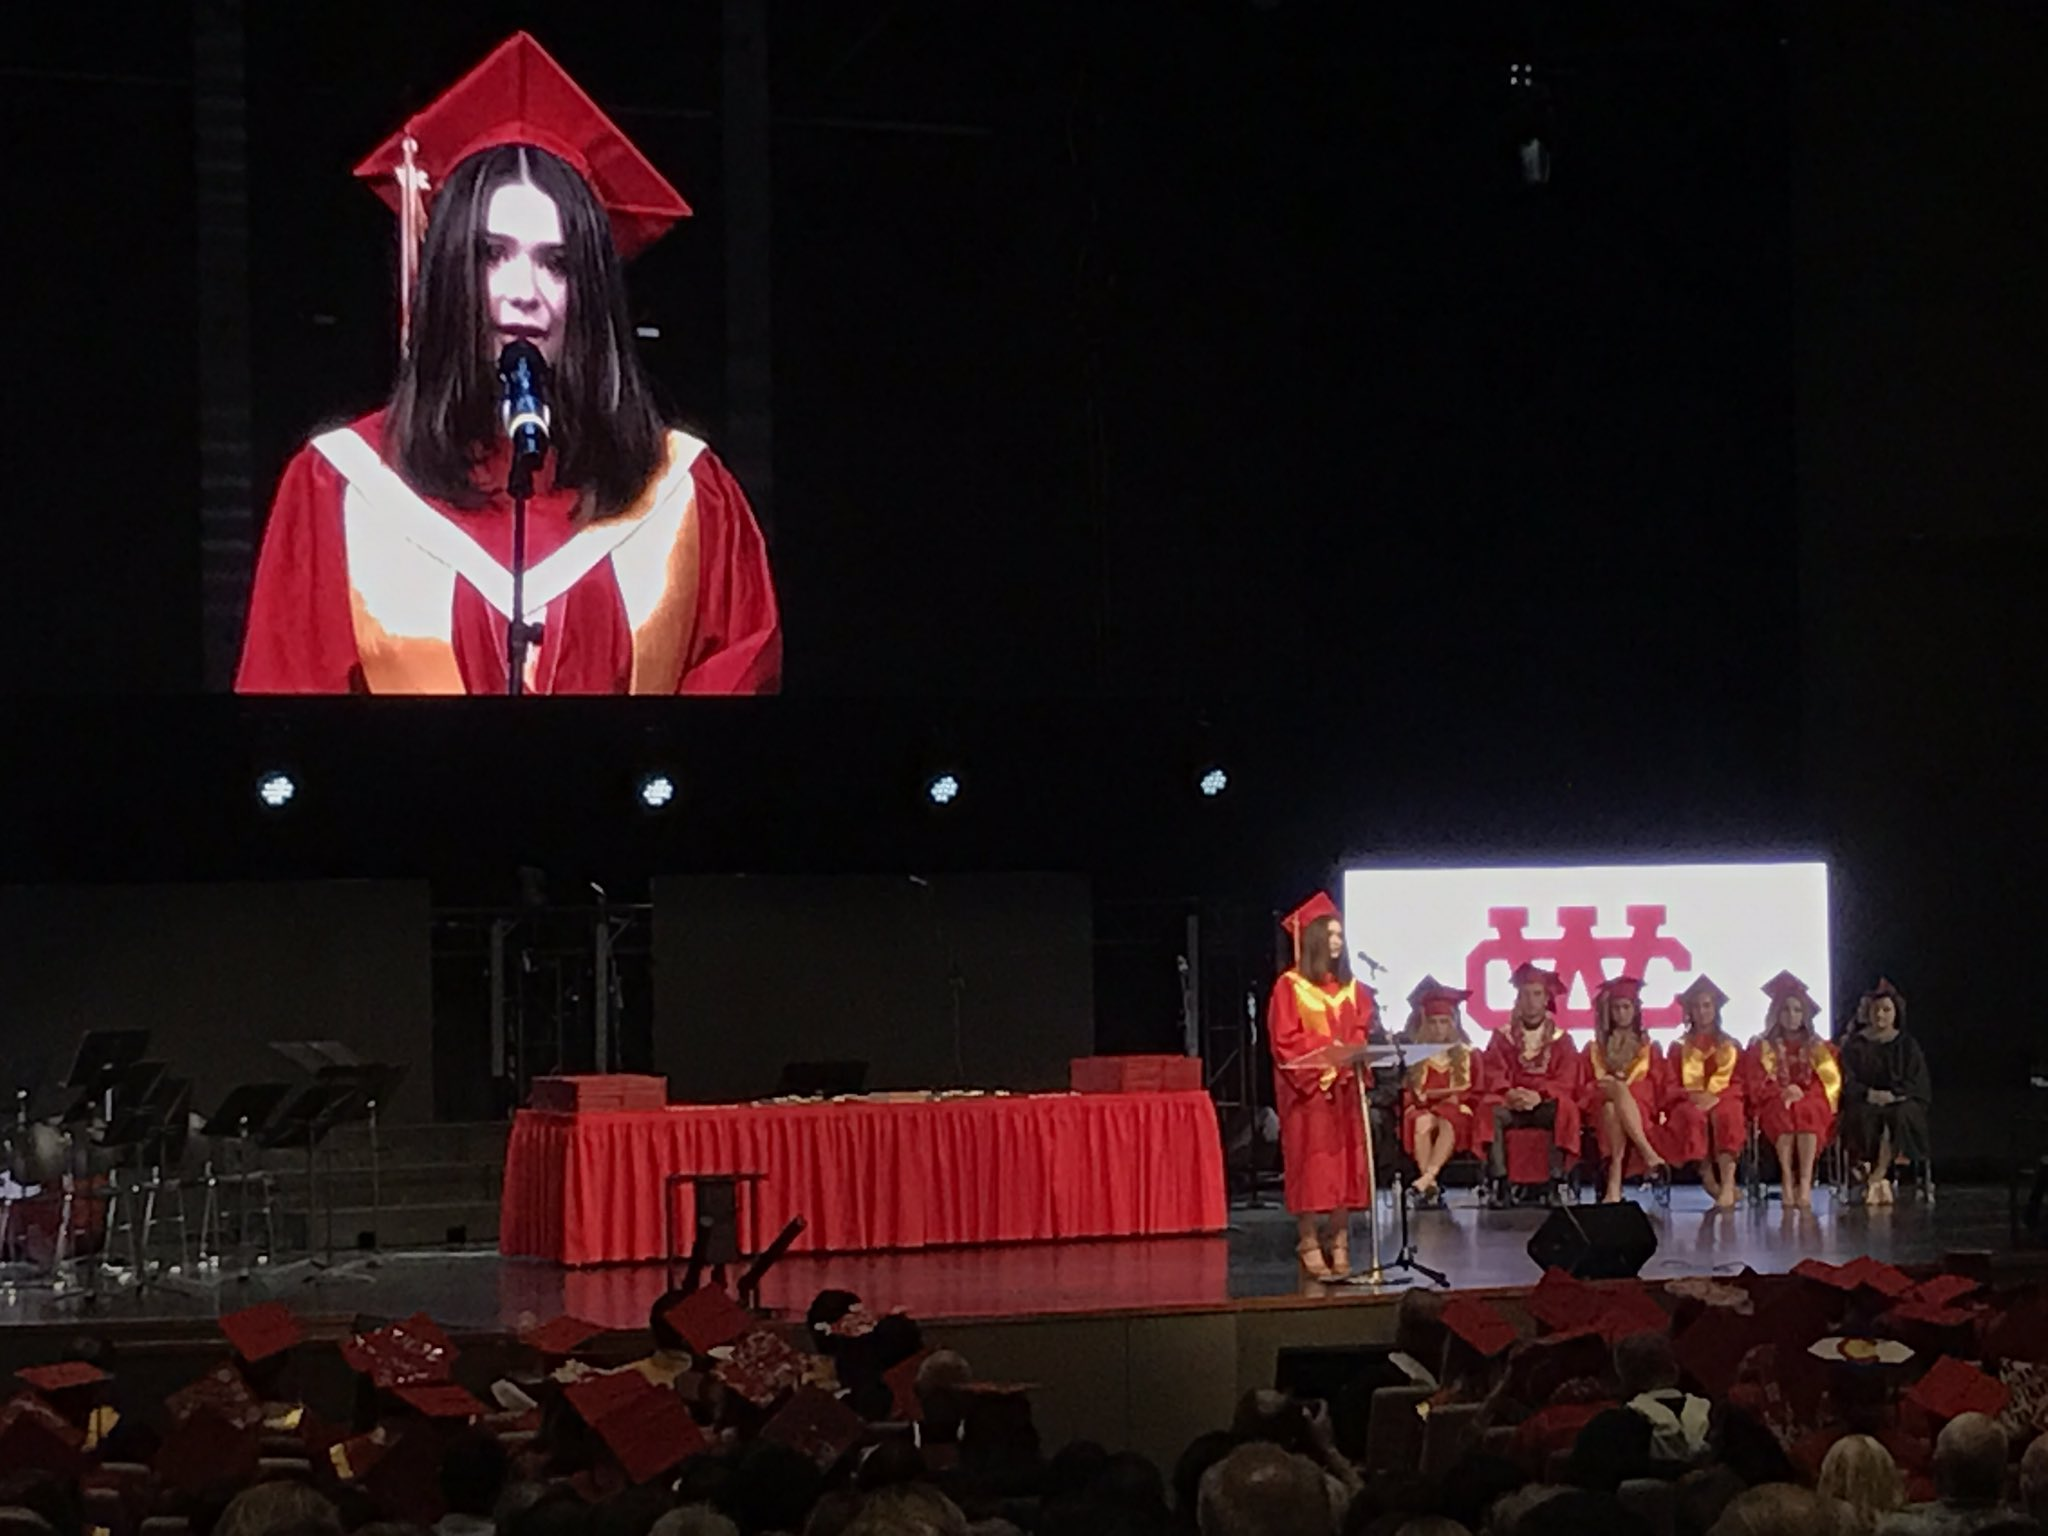 WC's Class of 2017 Valedictorian Grace Grannis! #wcheralds #valedictorian @wchsheralds2017 https://t.co/UwVwPKnzHu